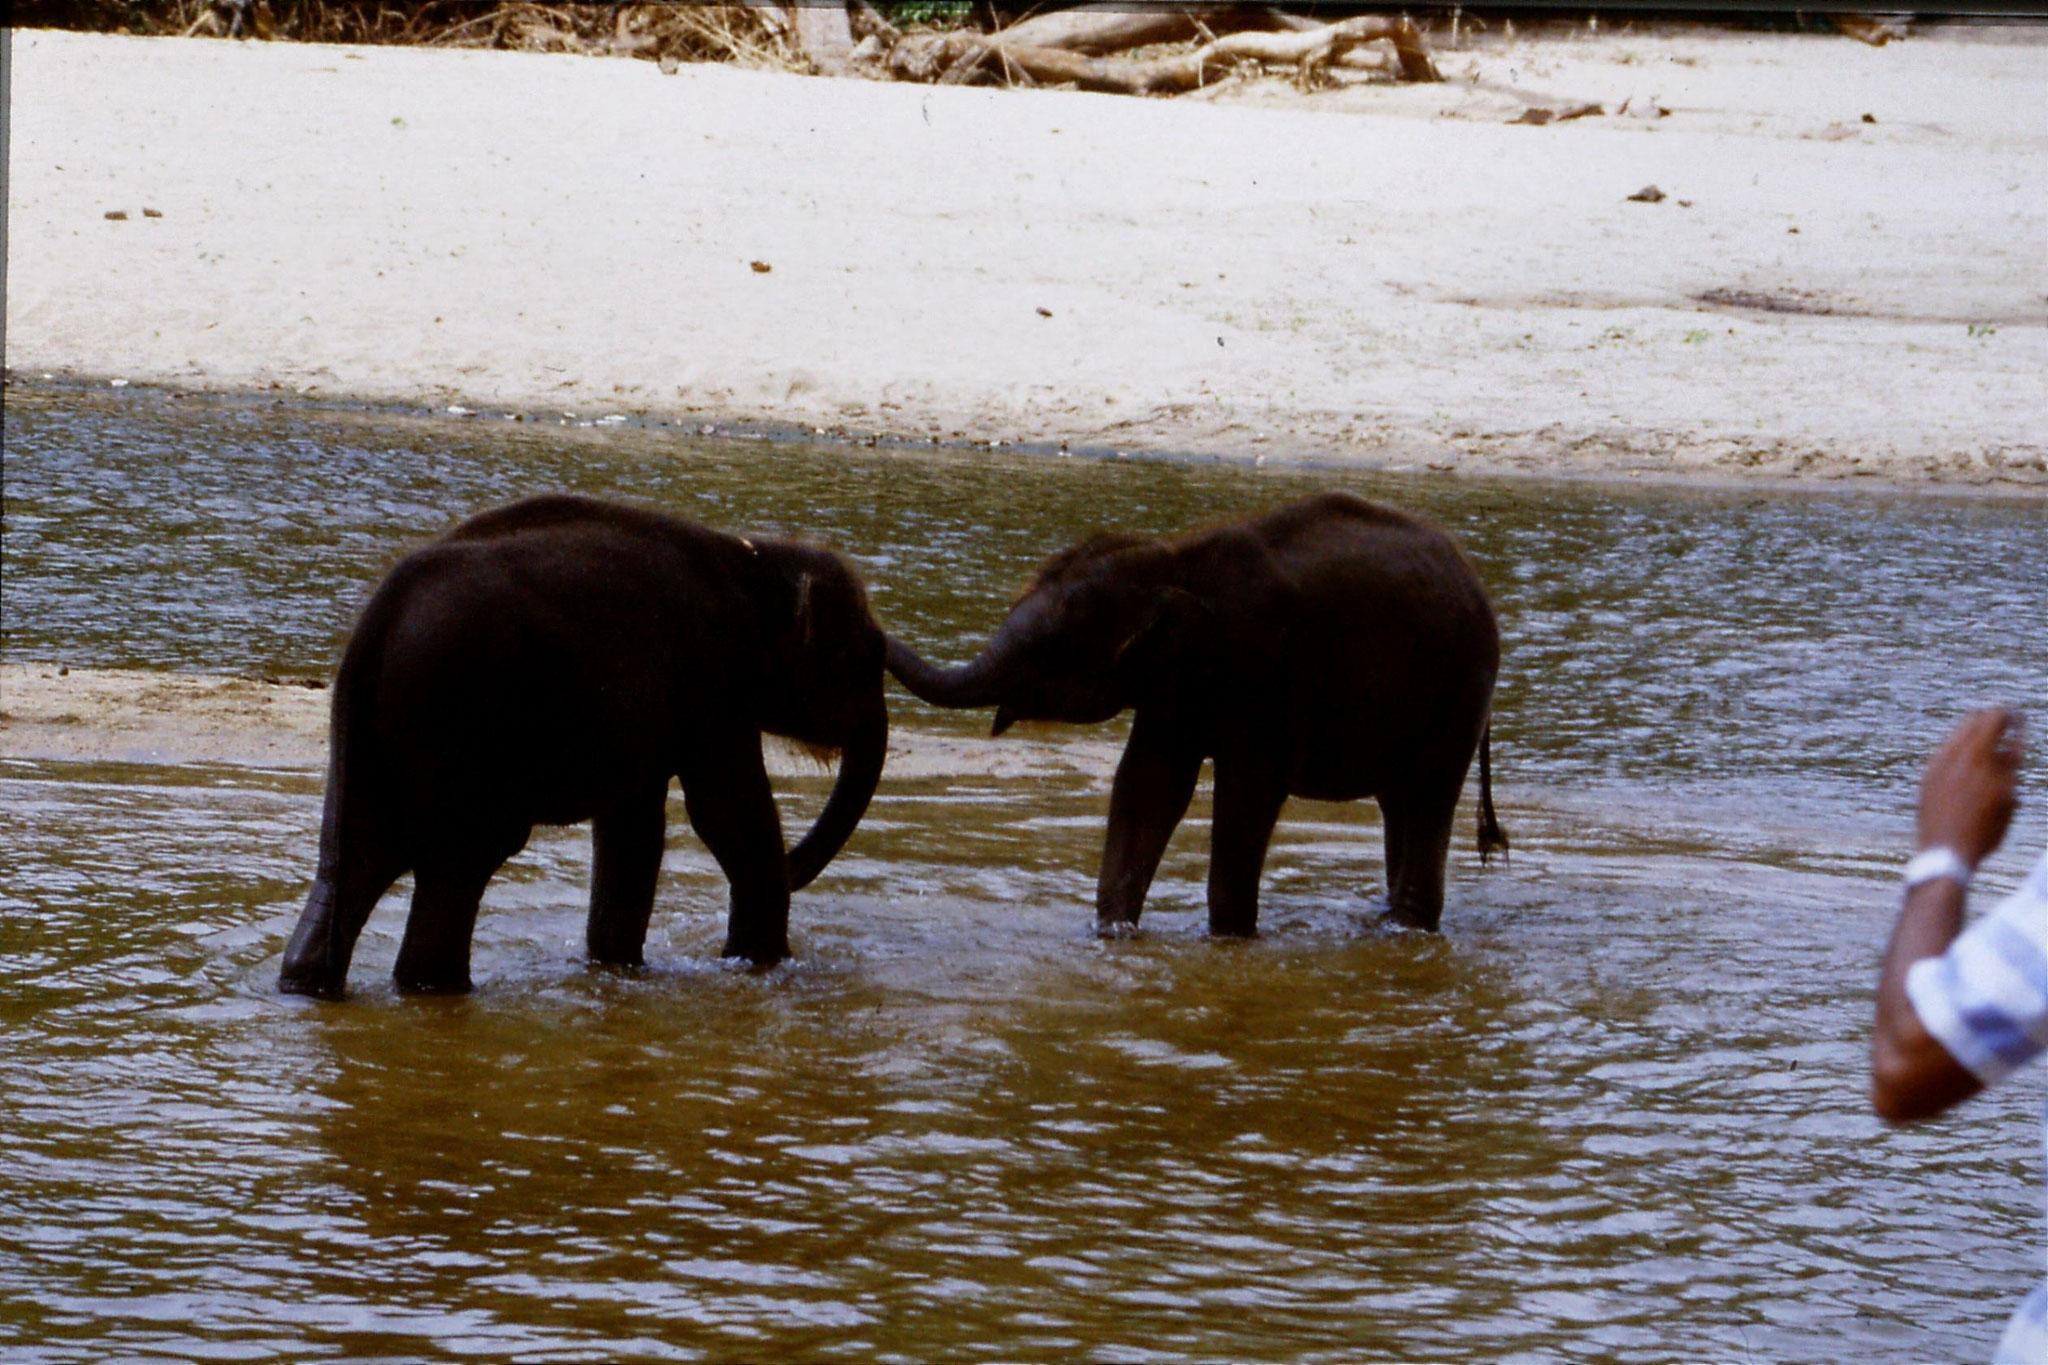 10/2/1990: 14: Kegalla elephant orphanage